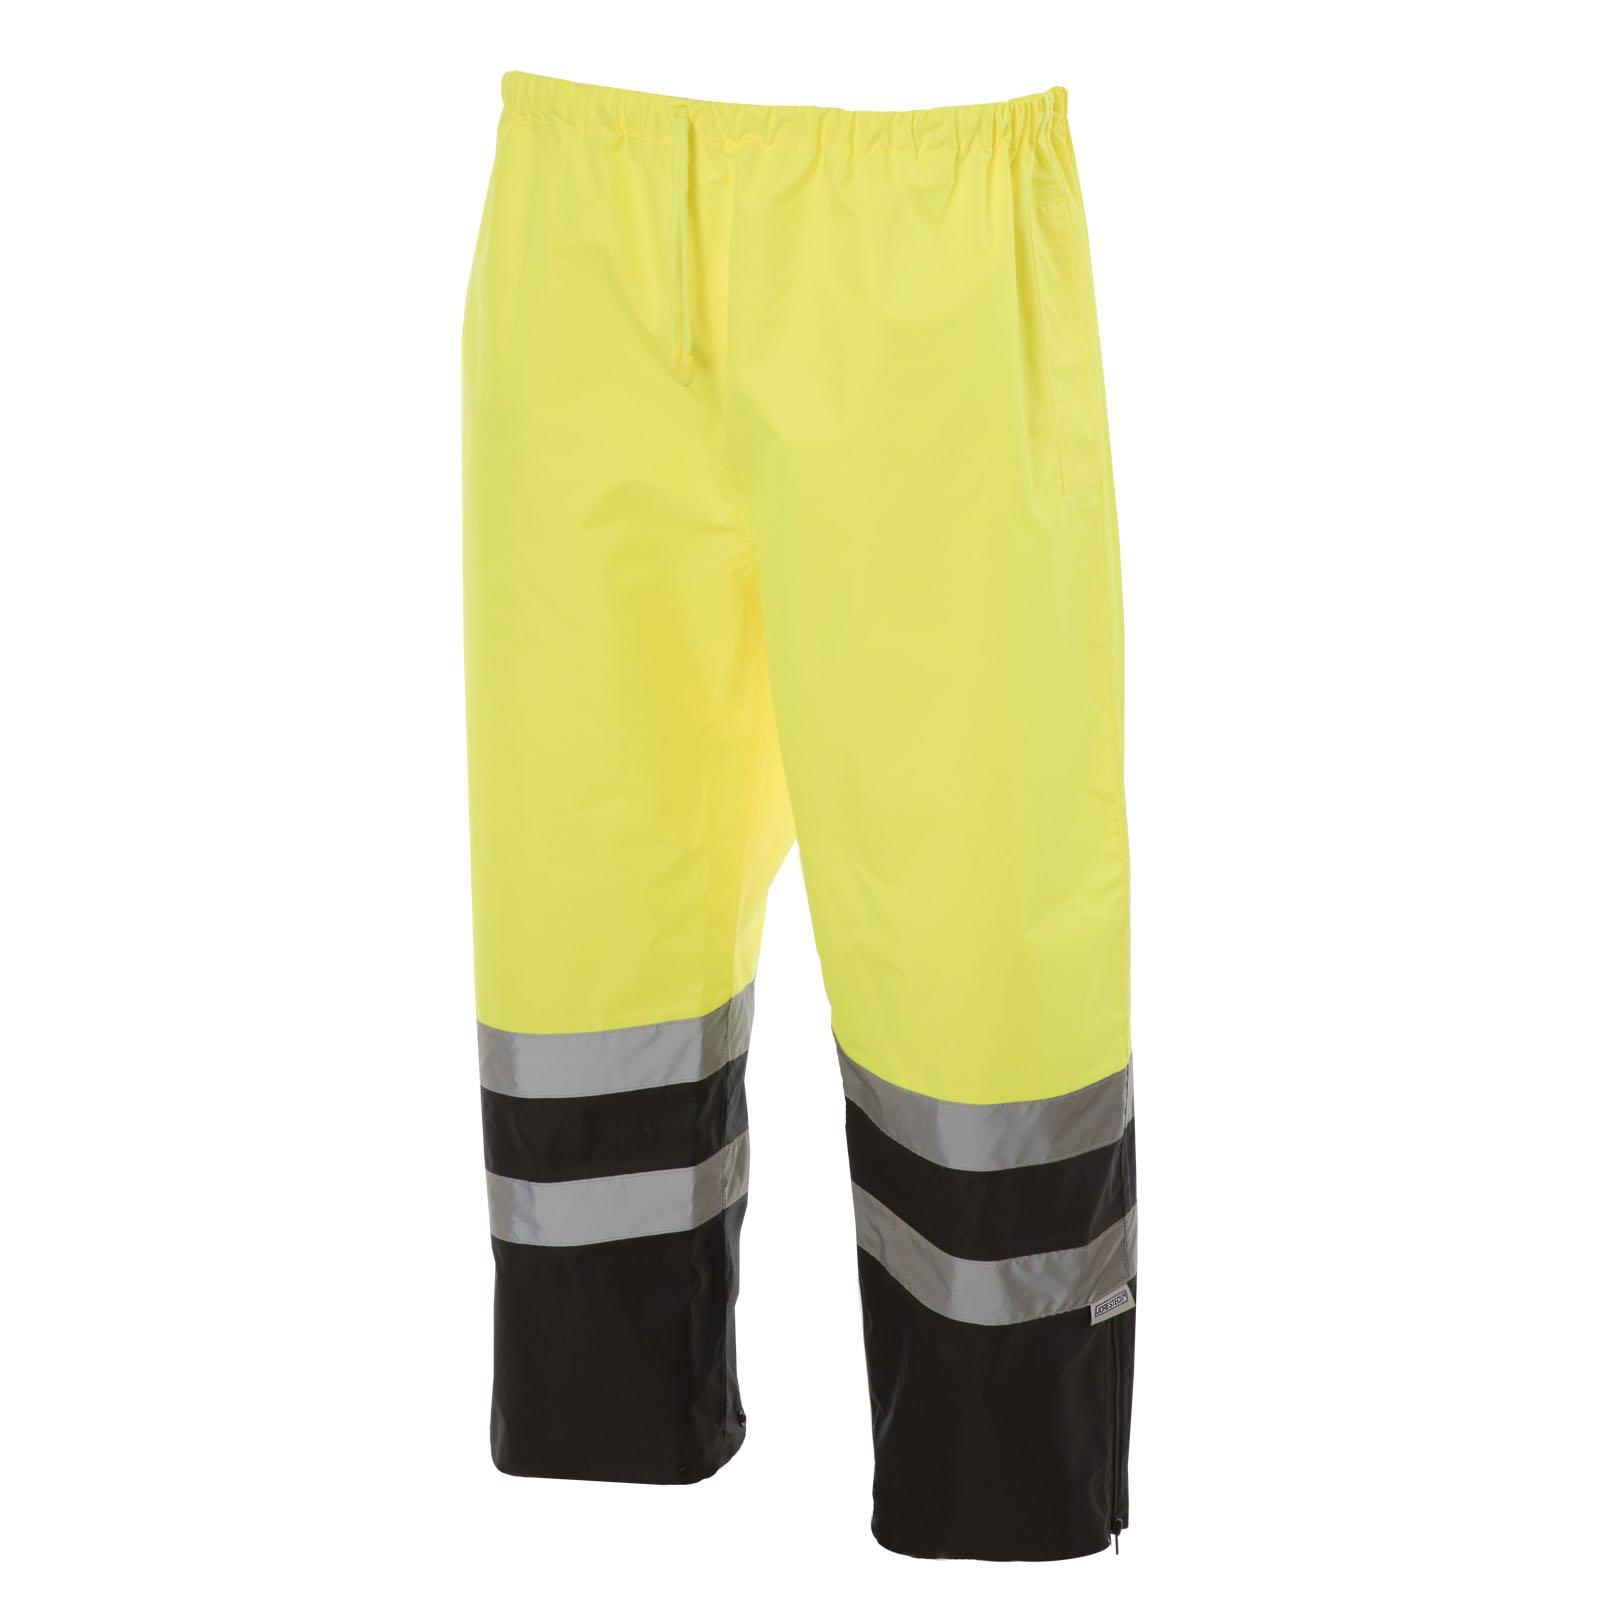 JORESTECH Light Weight Waterproof Rain Pants ANSI/ISEA 107-2015 Class 3 Level 2 Black and Yellow (3X-Large) by JORESTECH (Image #3)